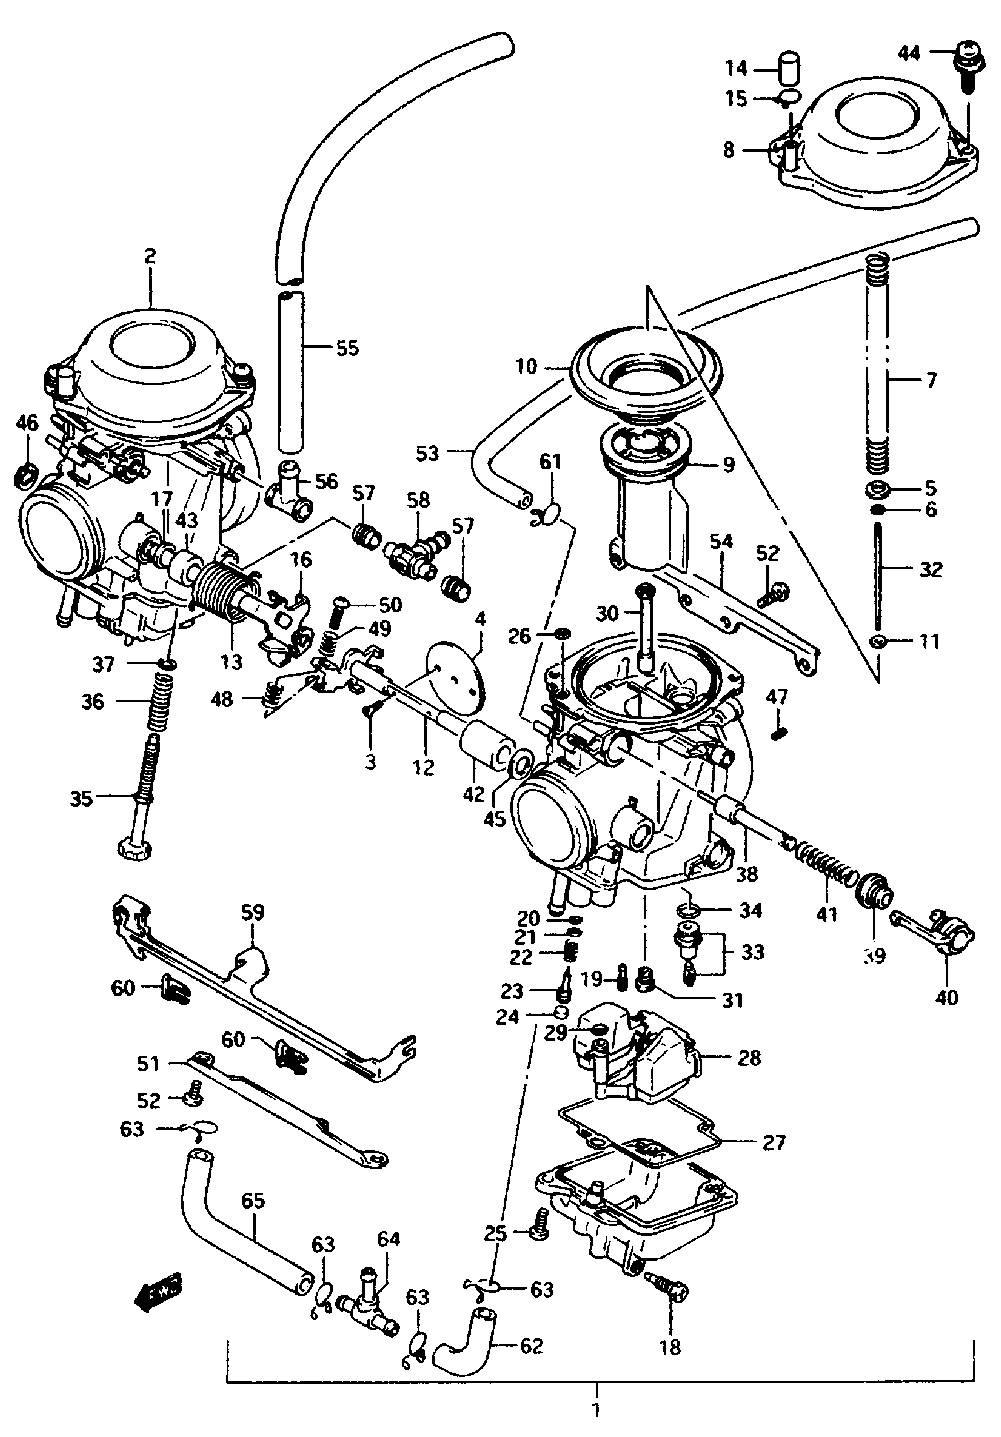 hight resolution of keihin vb carb diagram